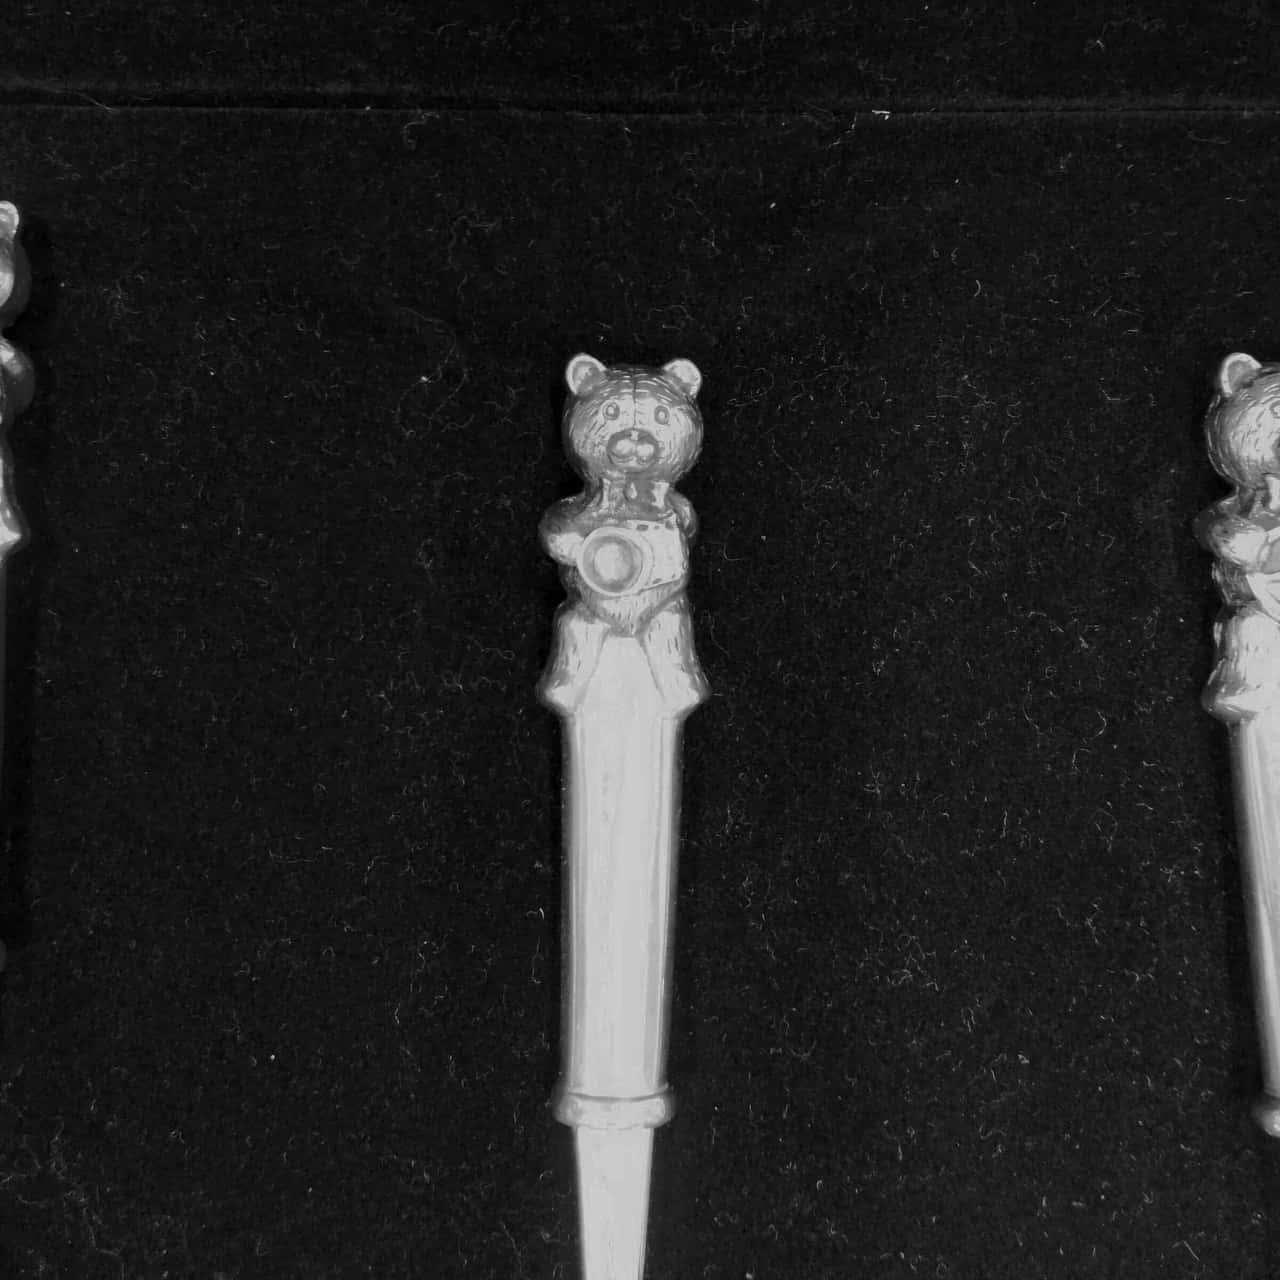 Christening/New Baby Cutlery Set